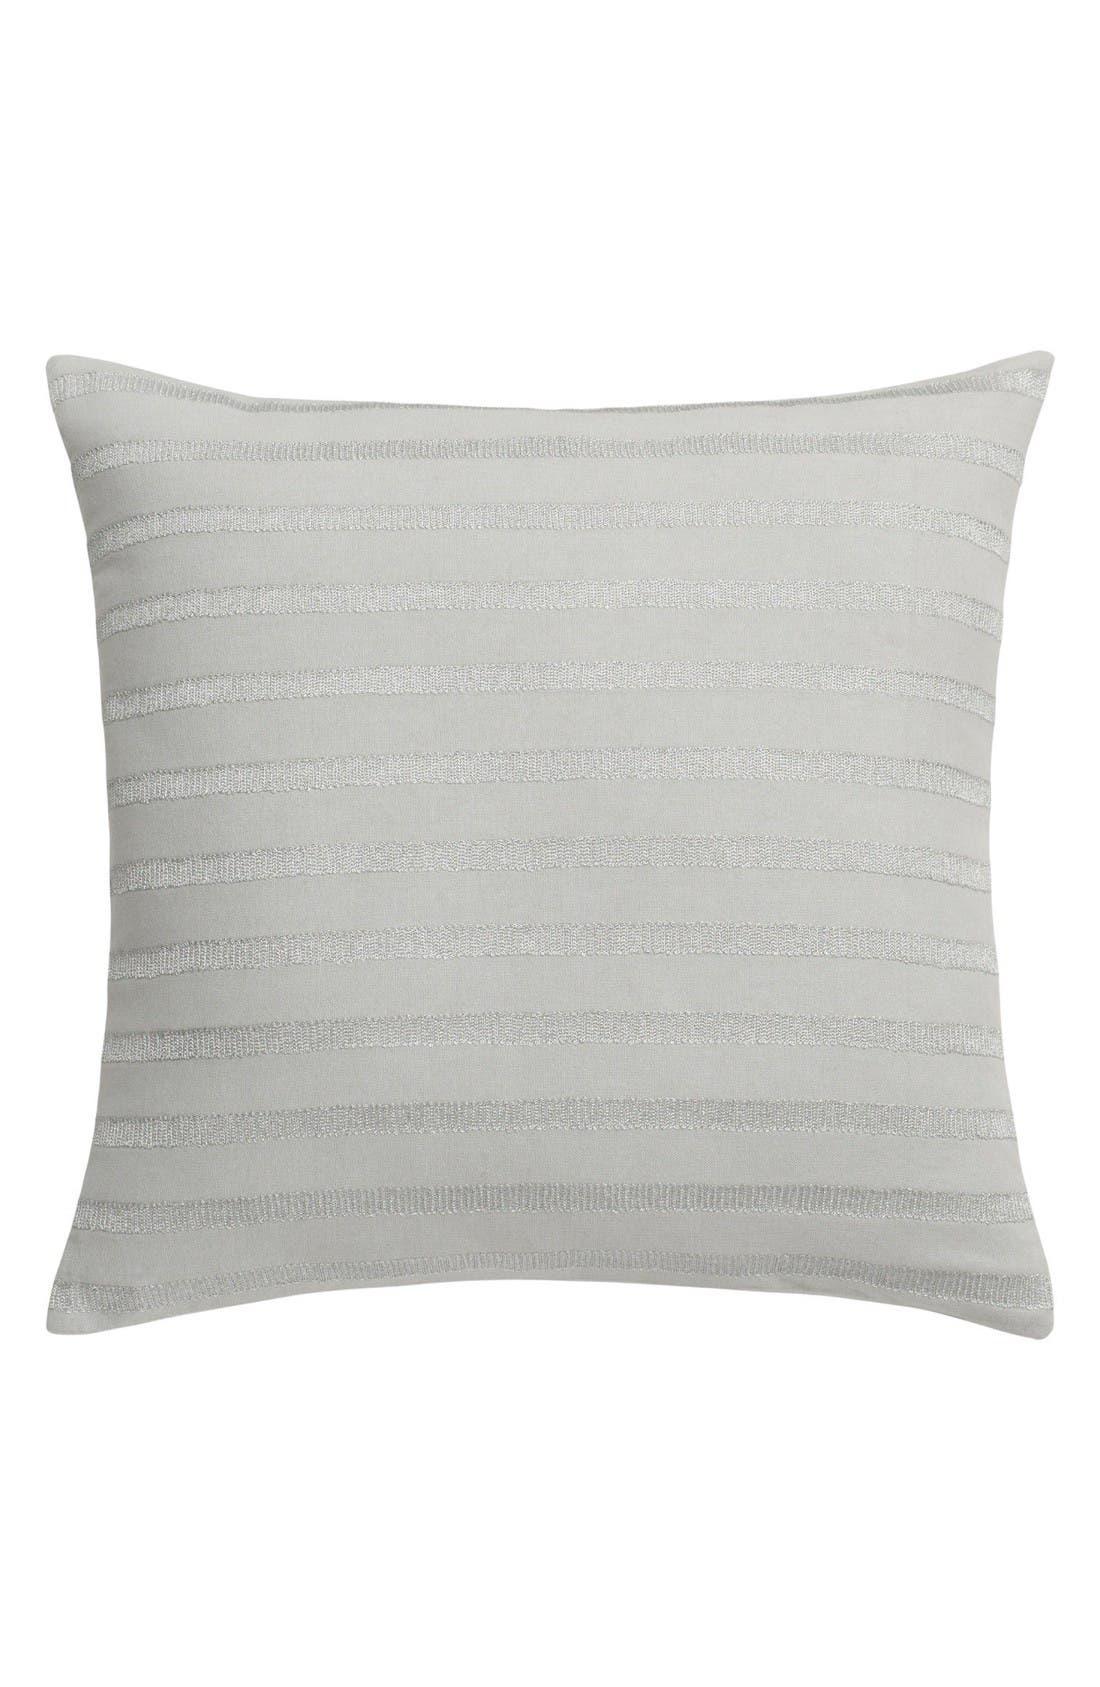 Alternate Image 1 Selected - Jill Rosenwald Capri Stripe Accent Pillow